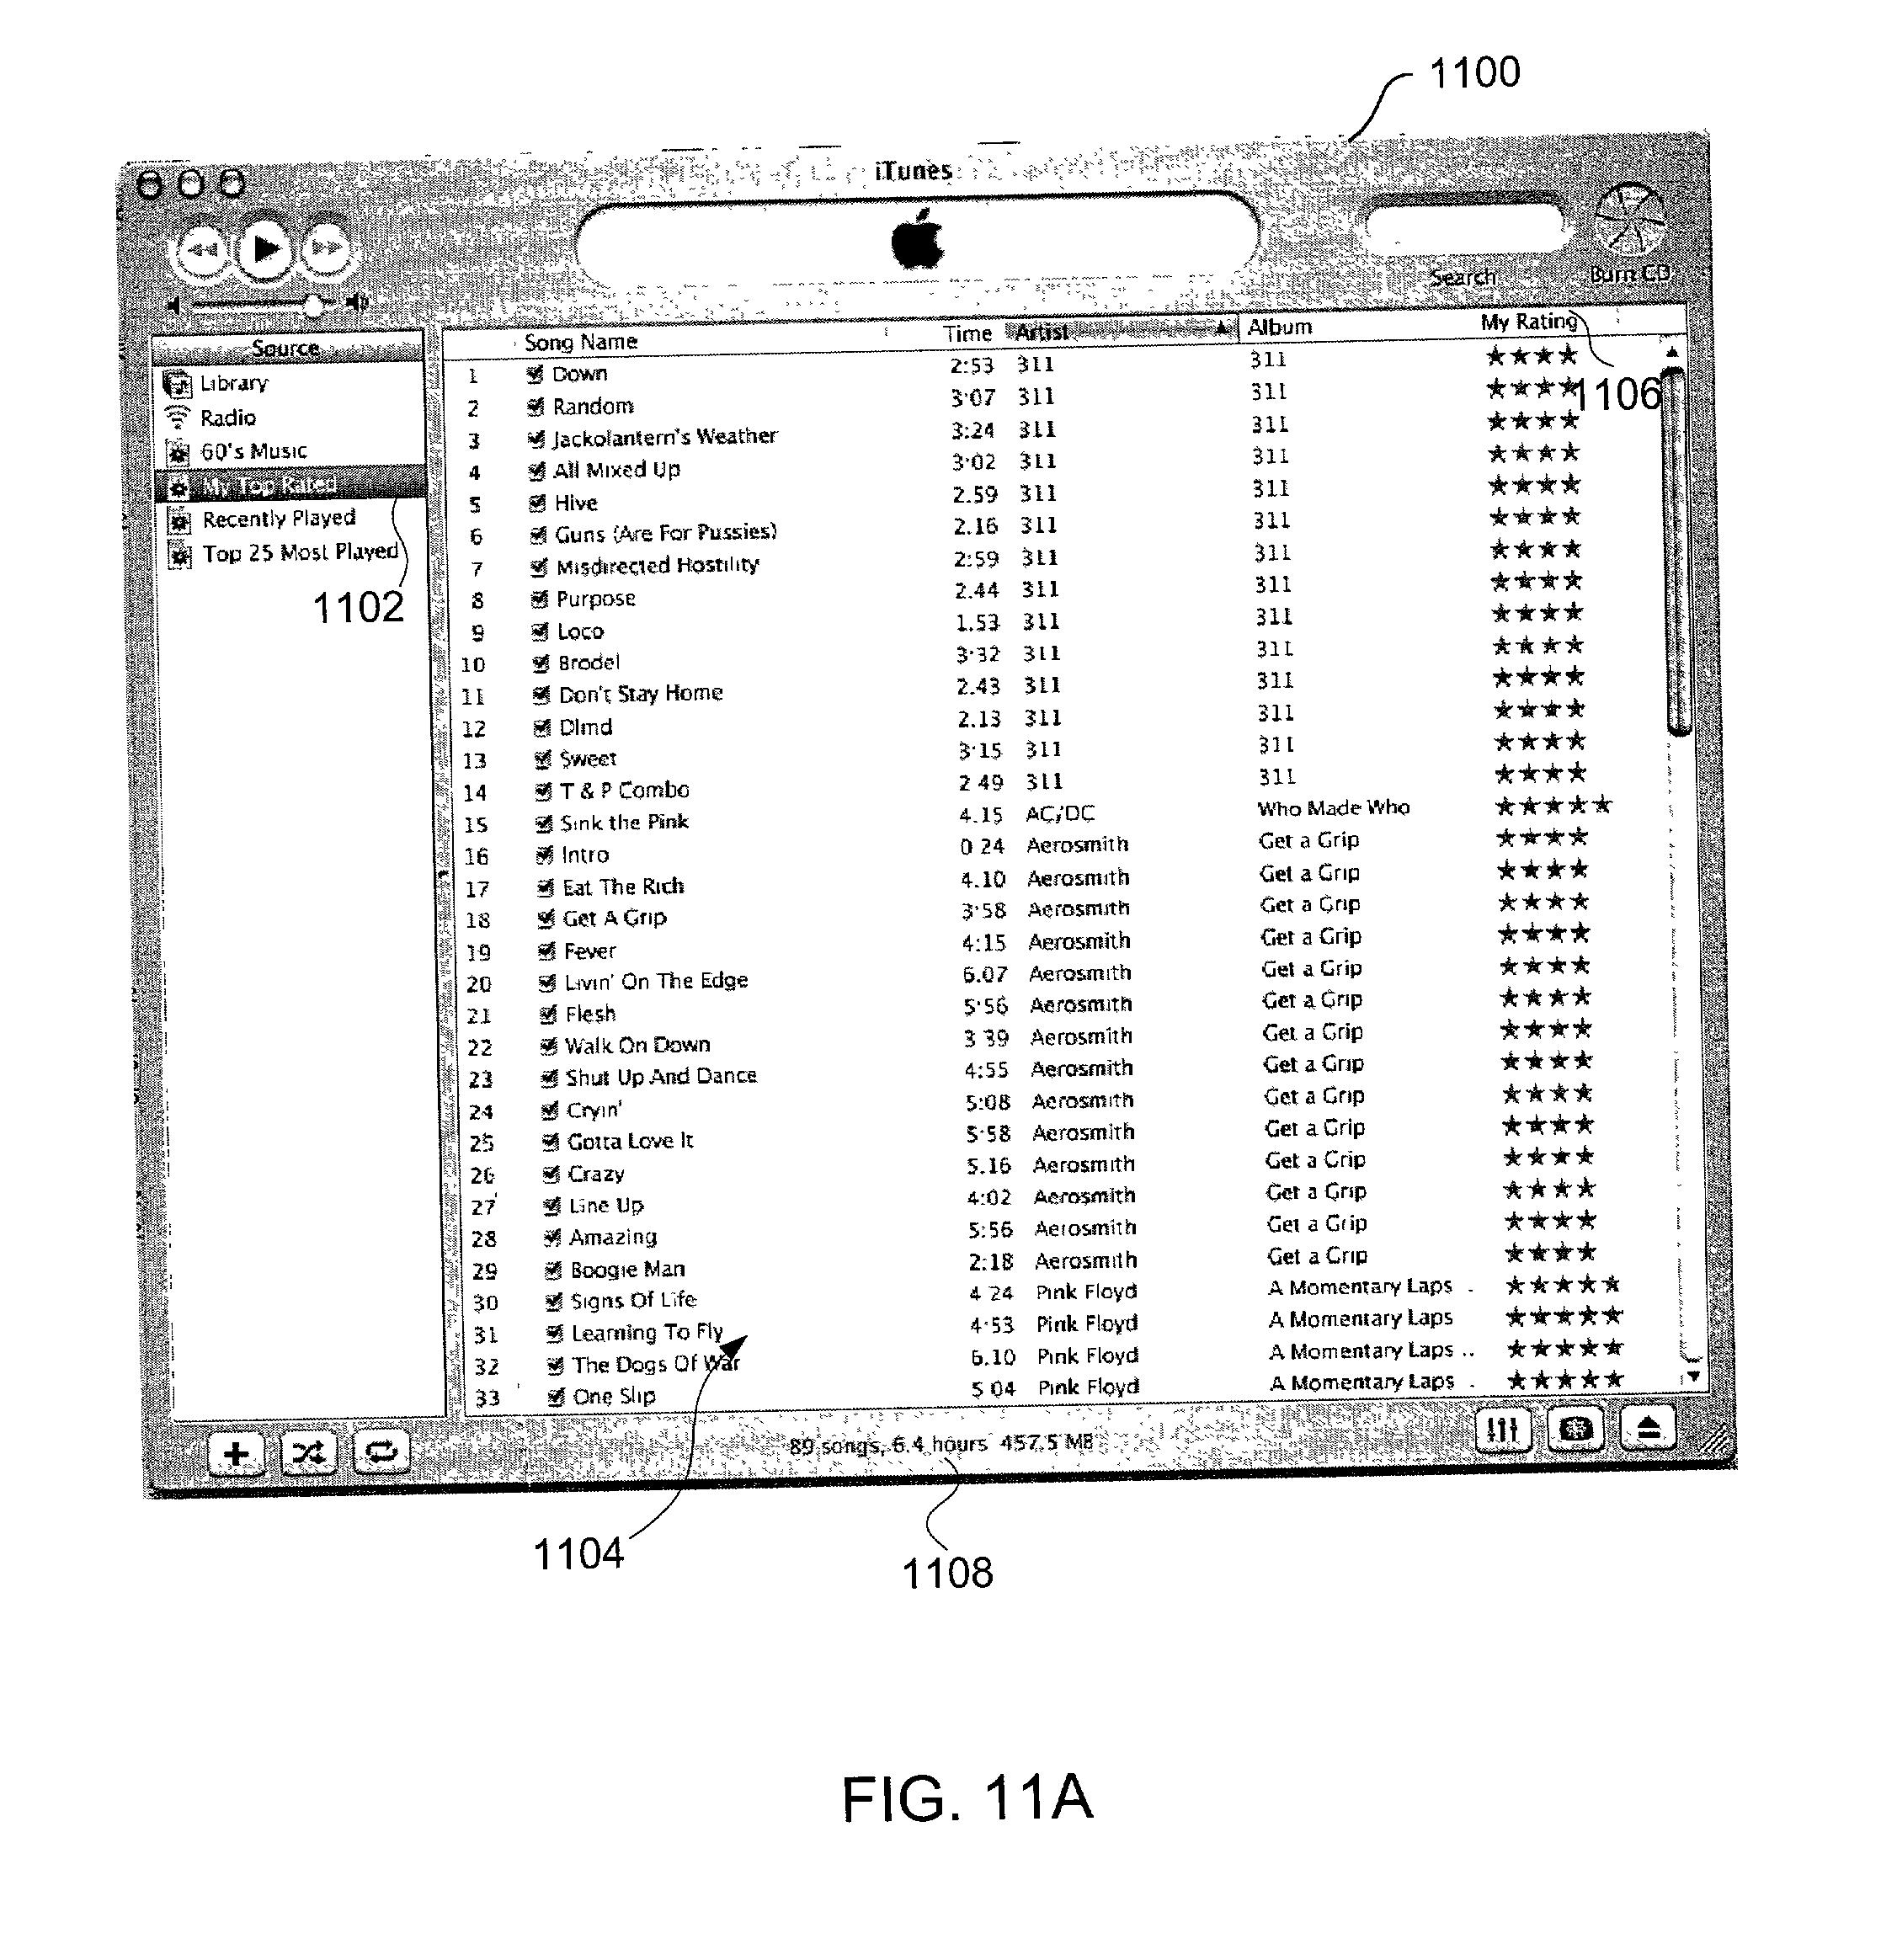 Patent US 7,797,446 B2